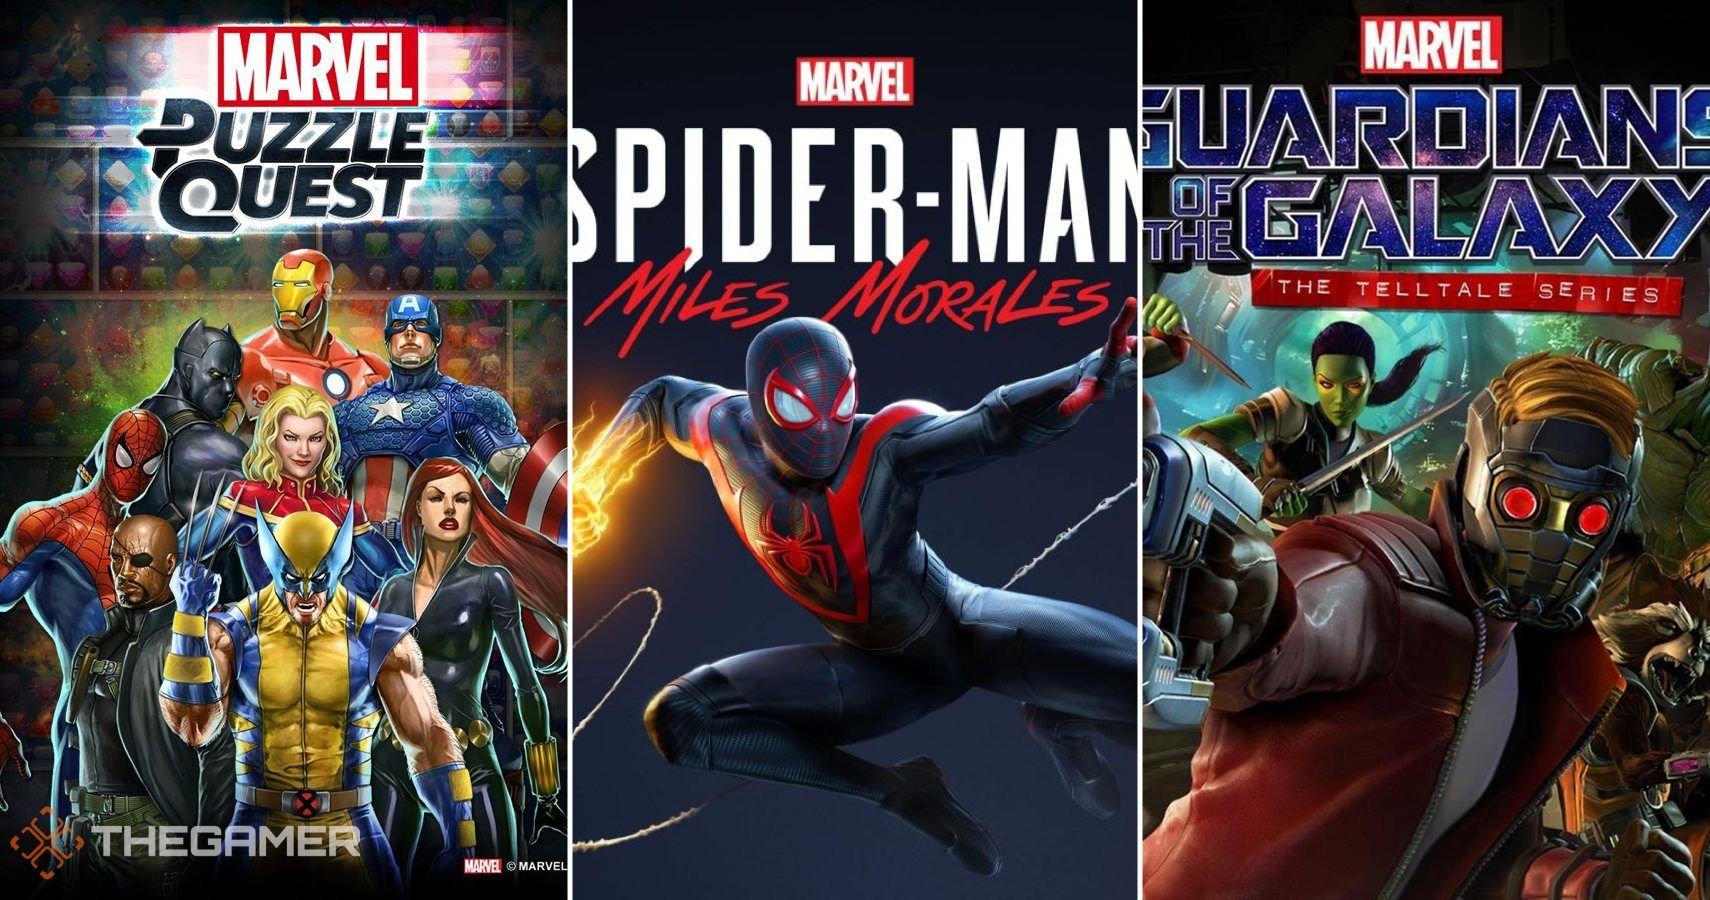 Marvel: The 10 Best Marvel Superhero Games Of The Last Decade (According To Metacritic)